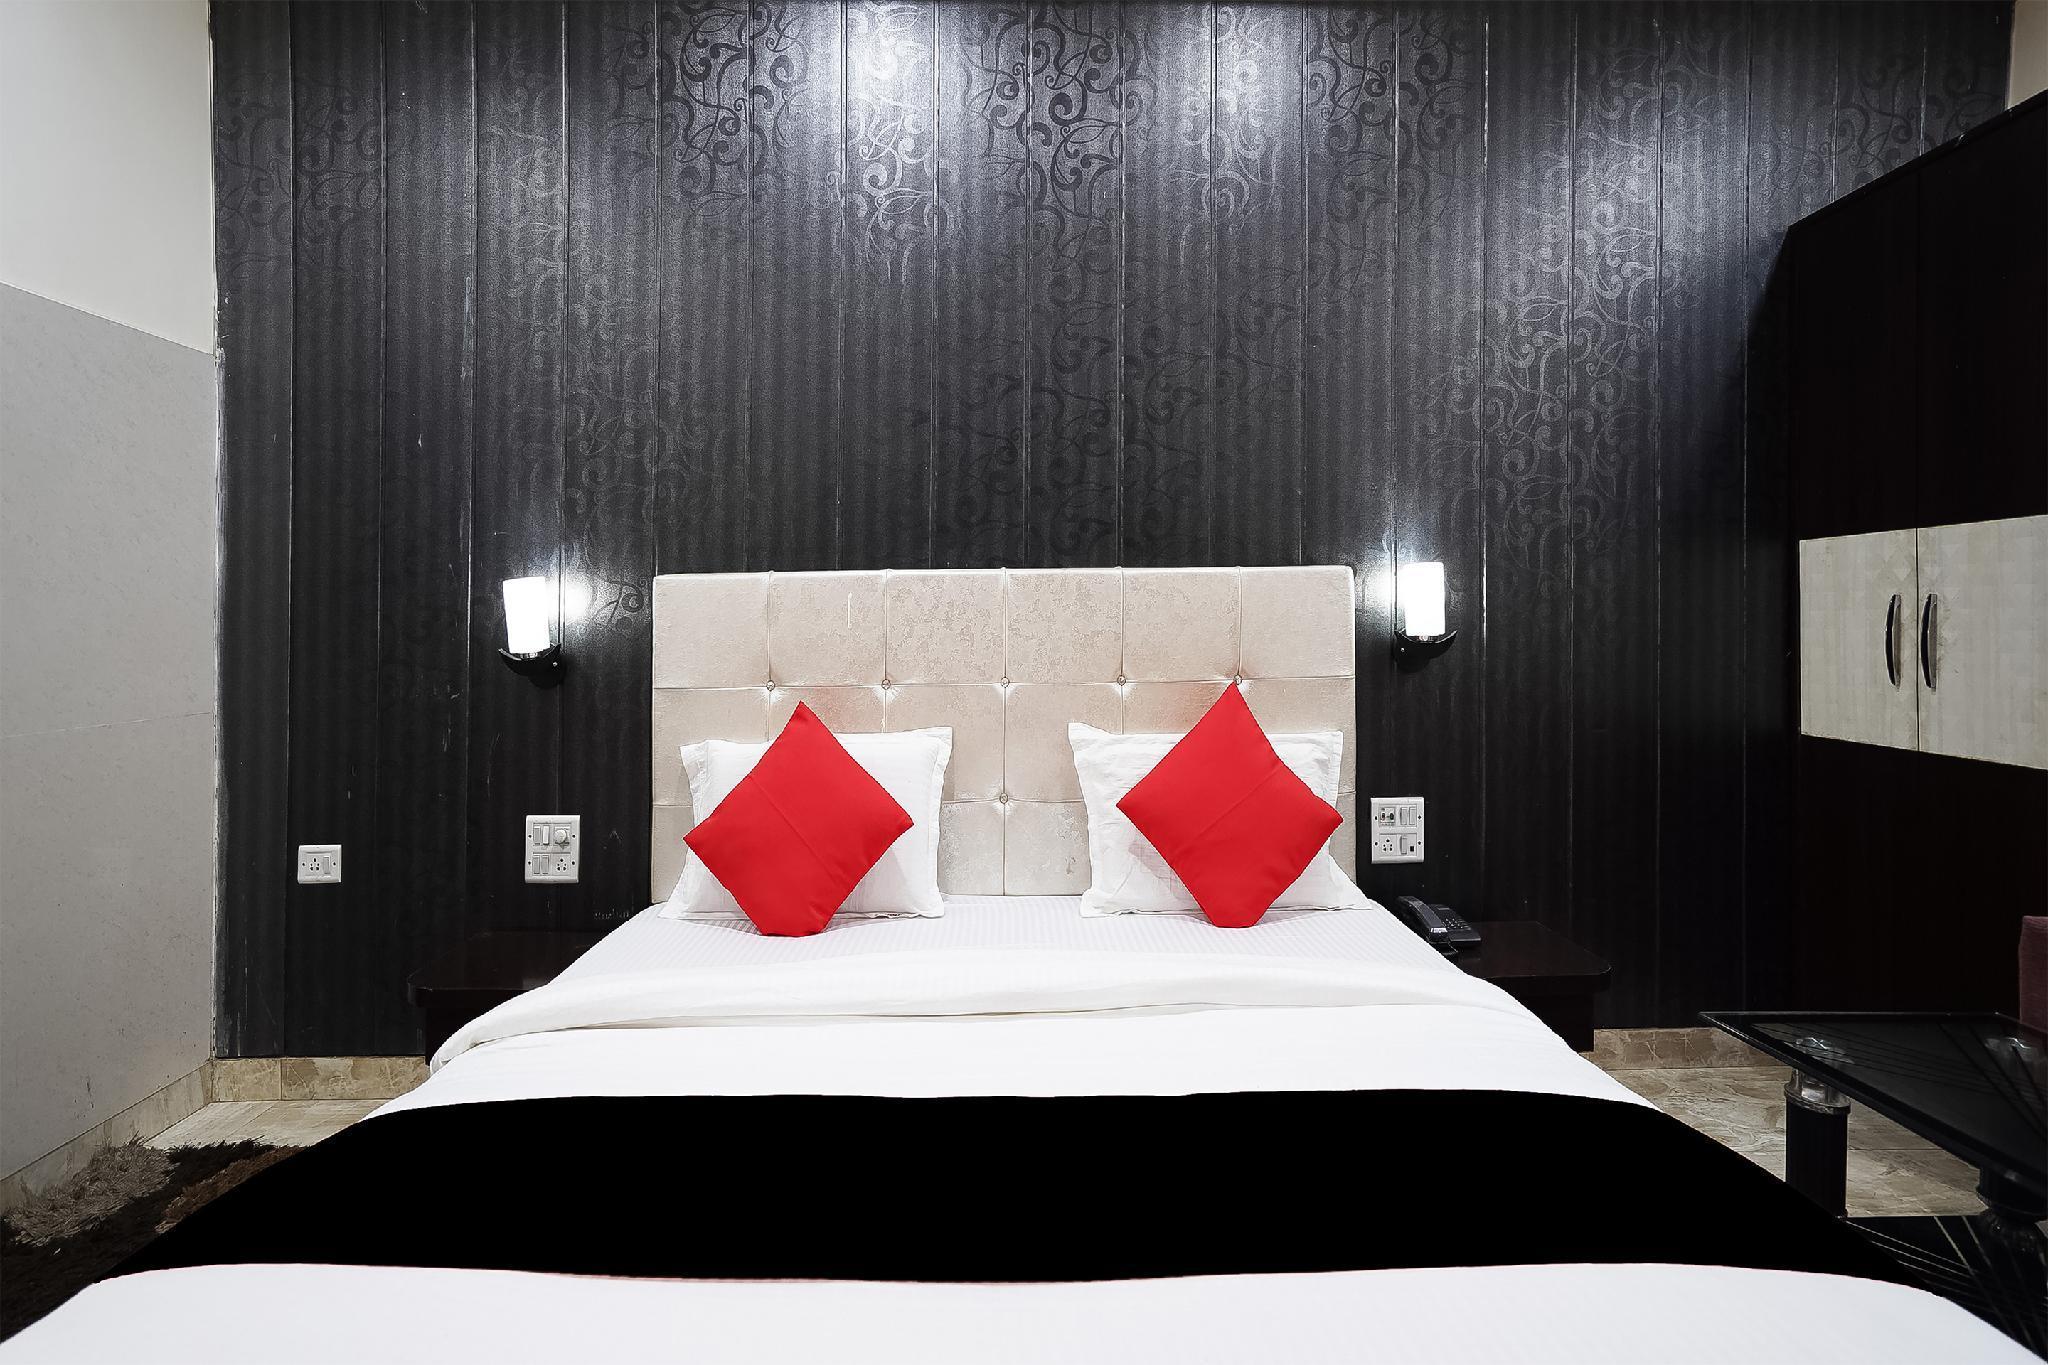 Capital O 49673 Hotel Grand Palace